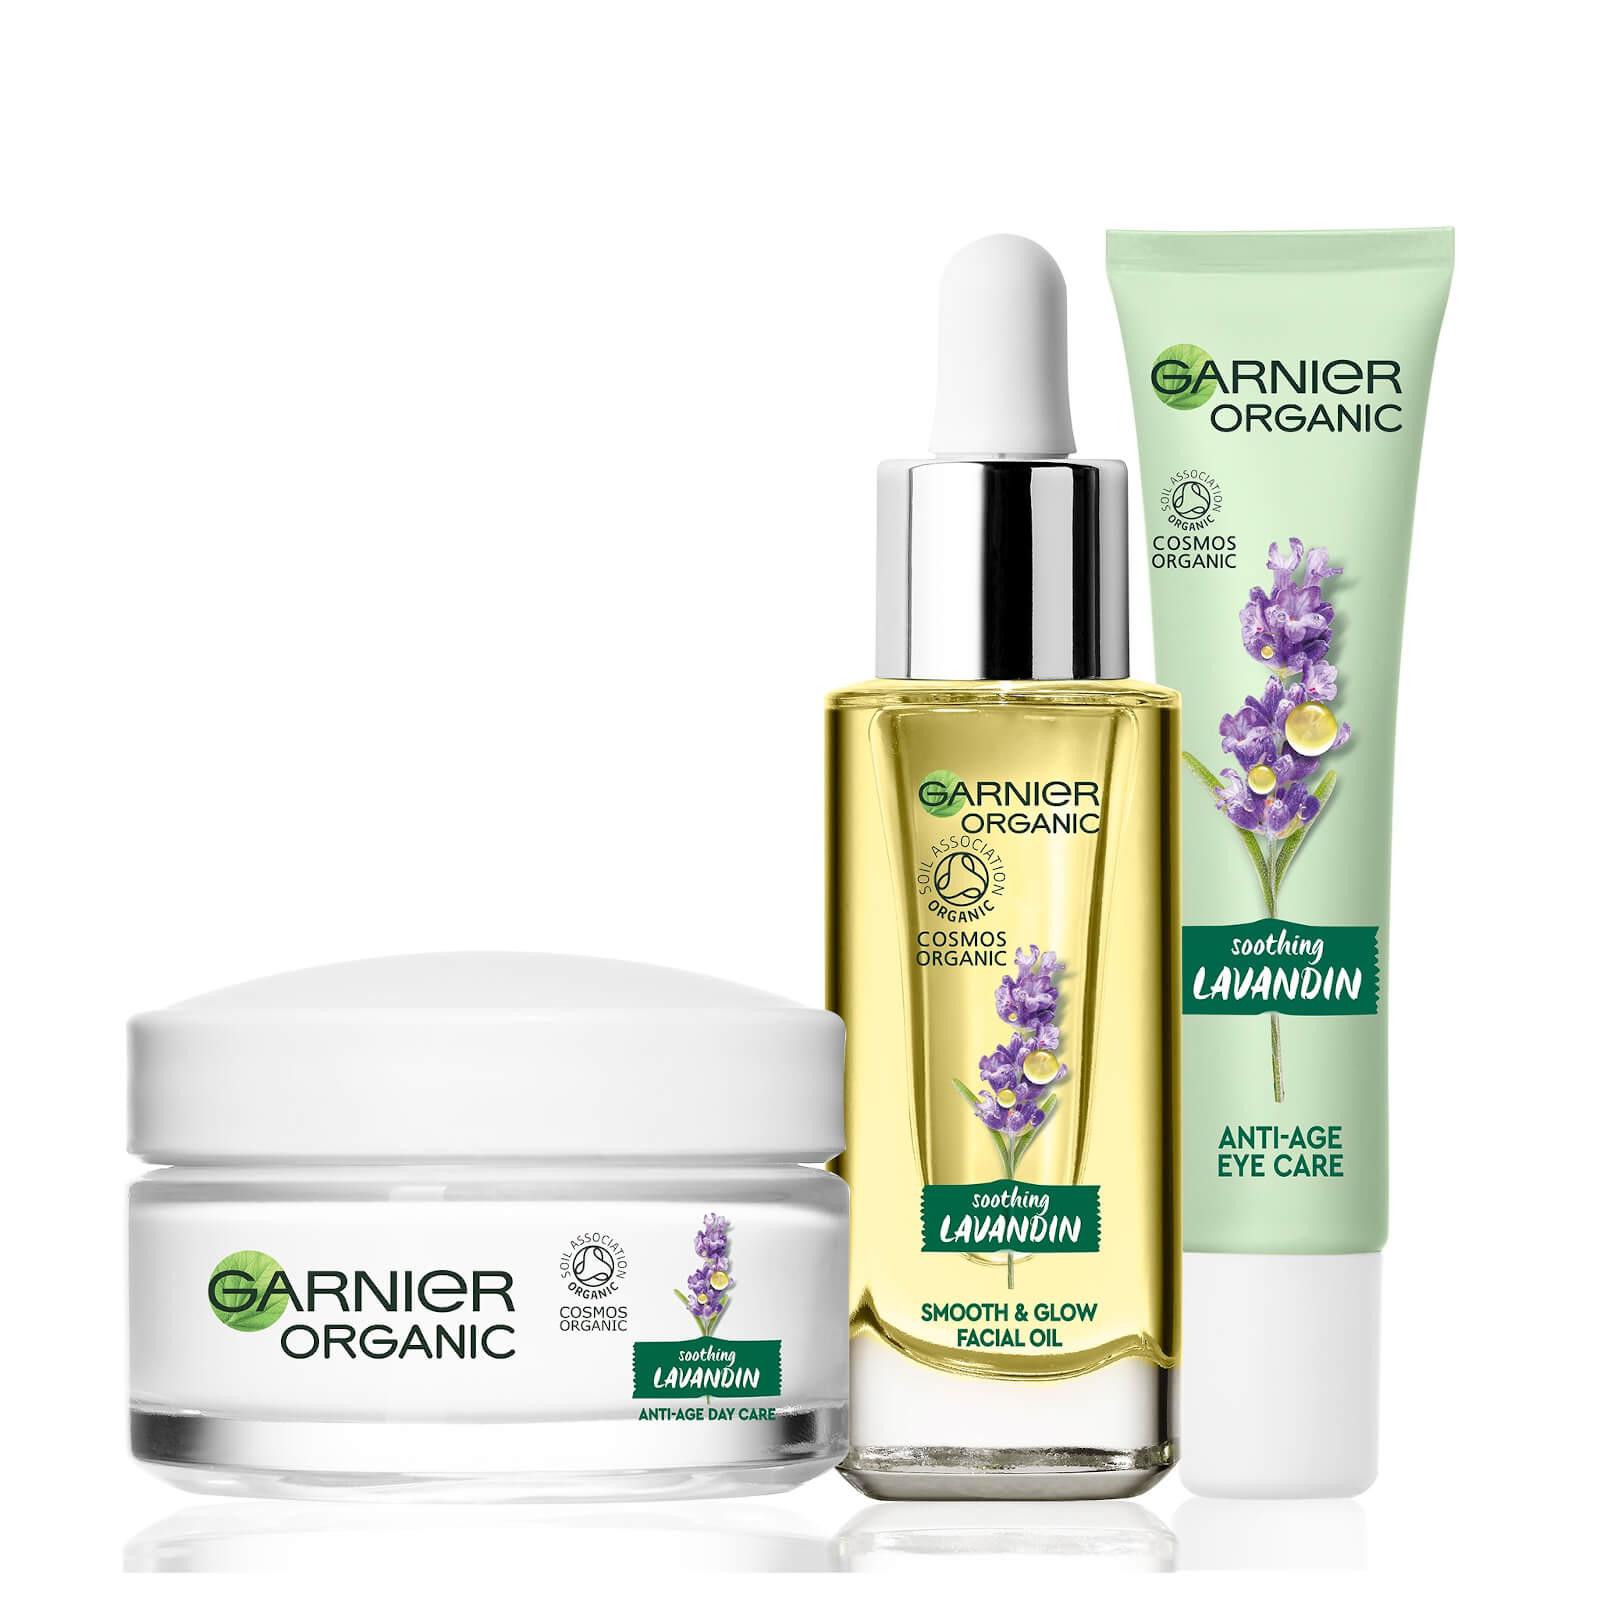 Купить Garnier Organic Lavandin Set: Eye Cream, Glow Facial Oil & Anti-Age Day Care Cream